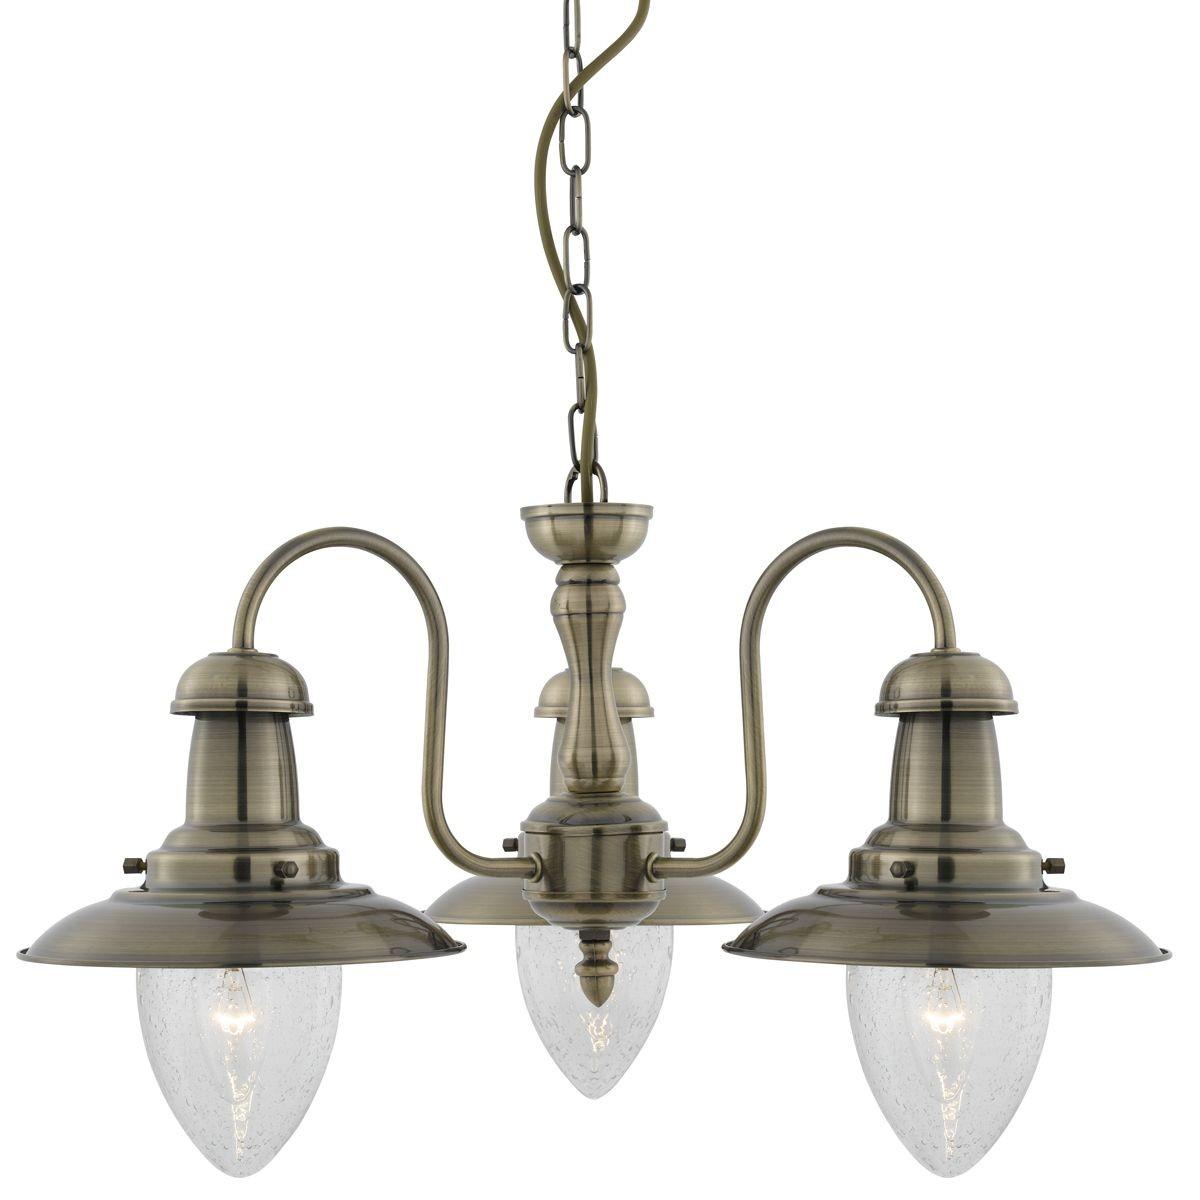 Fisherman Lantern Ceiling Light